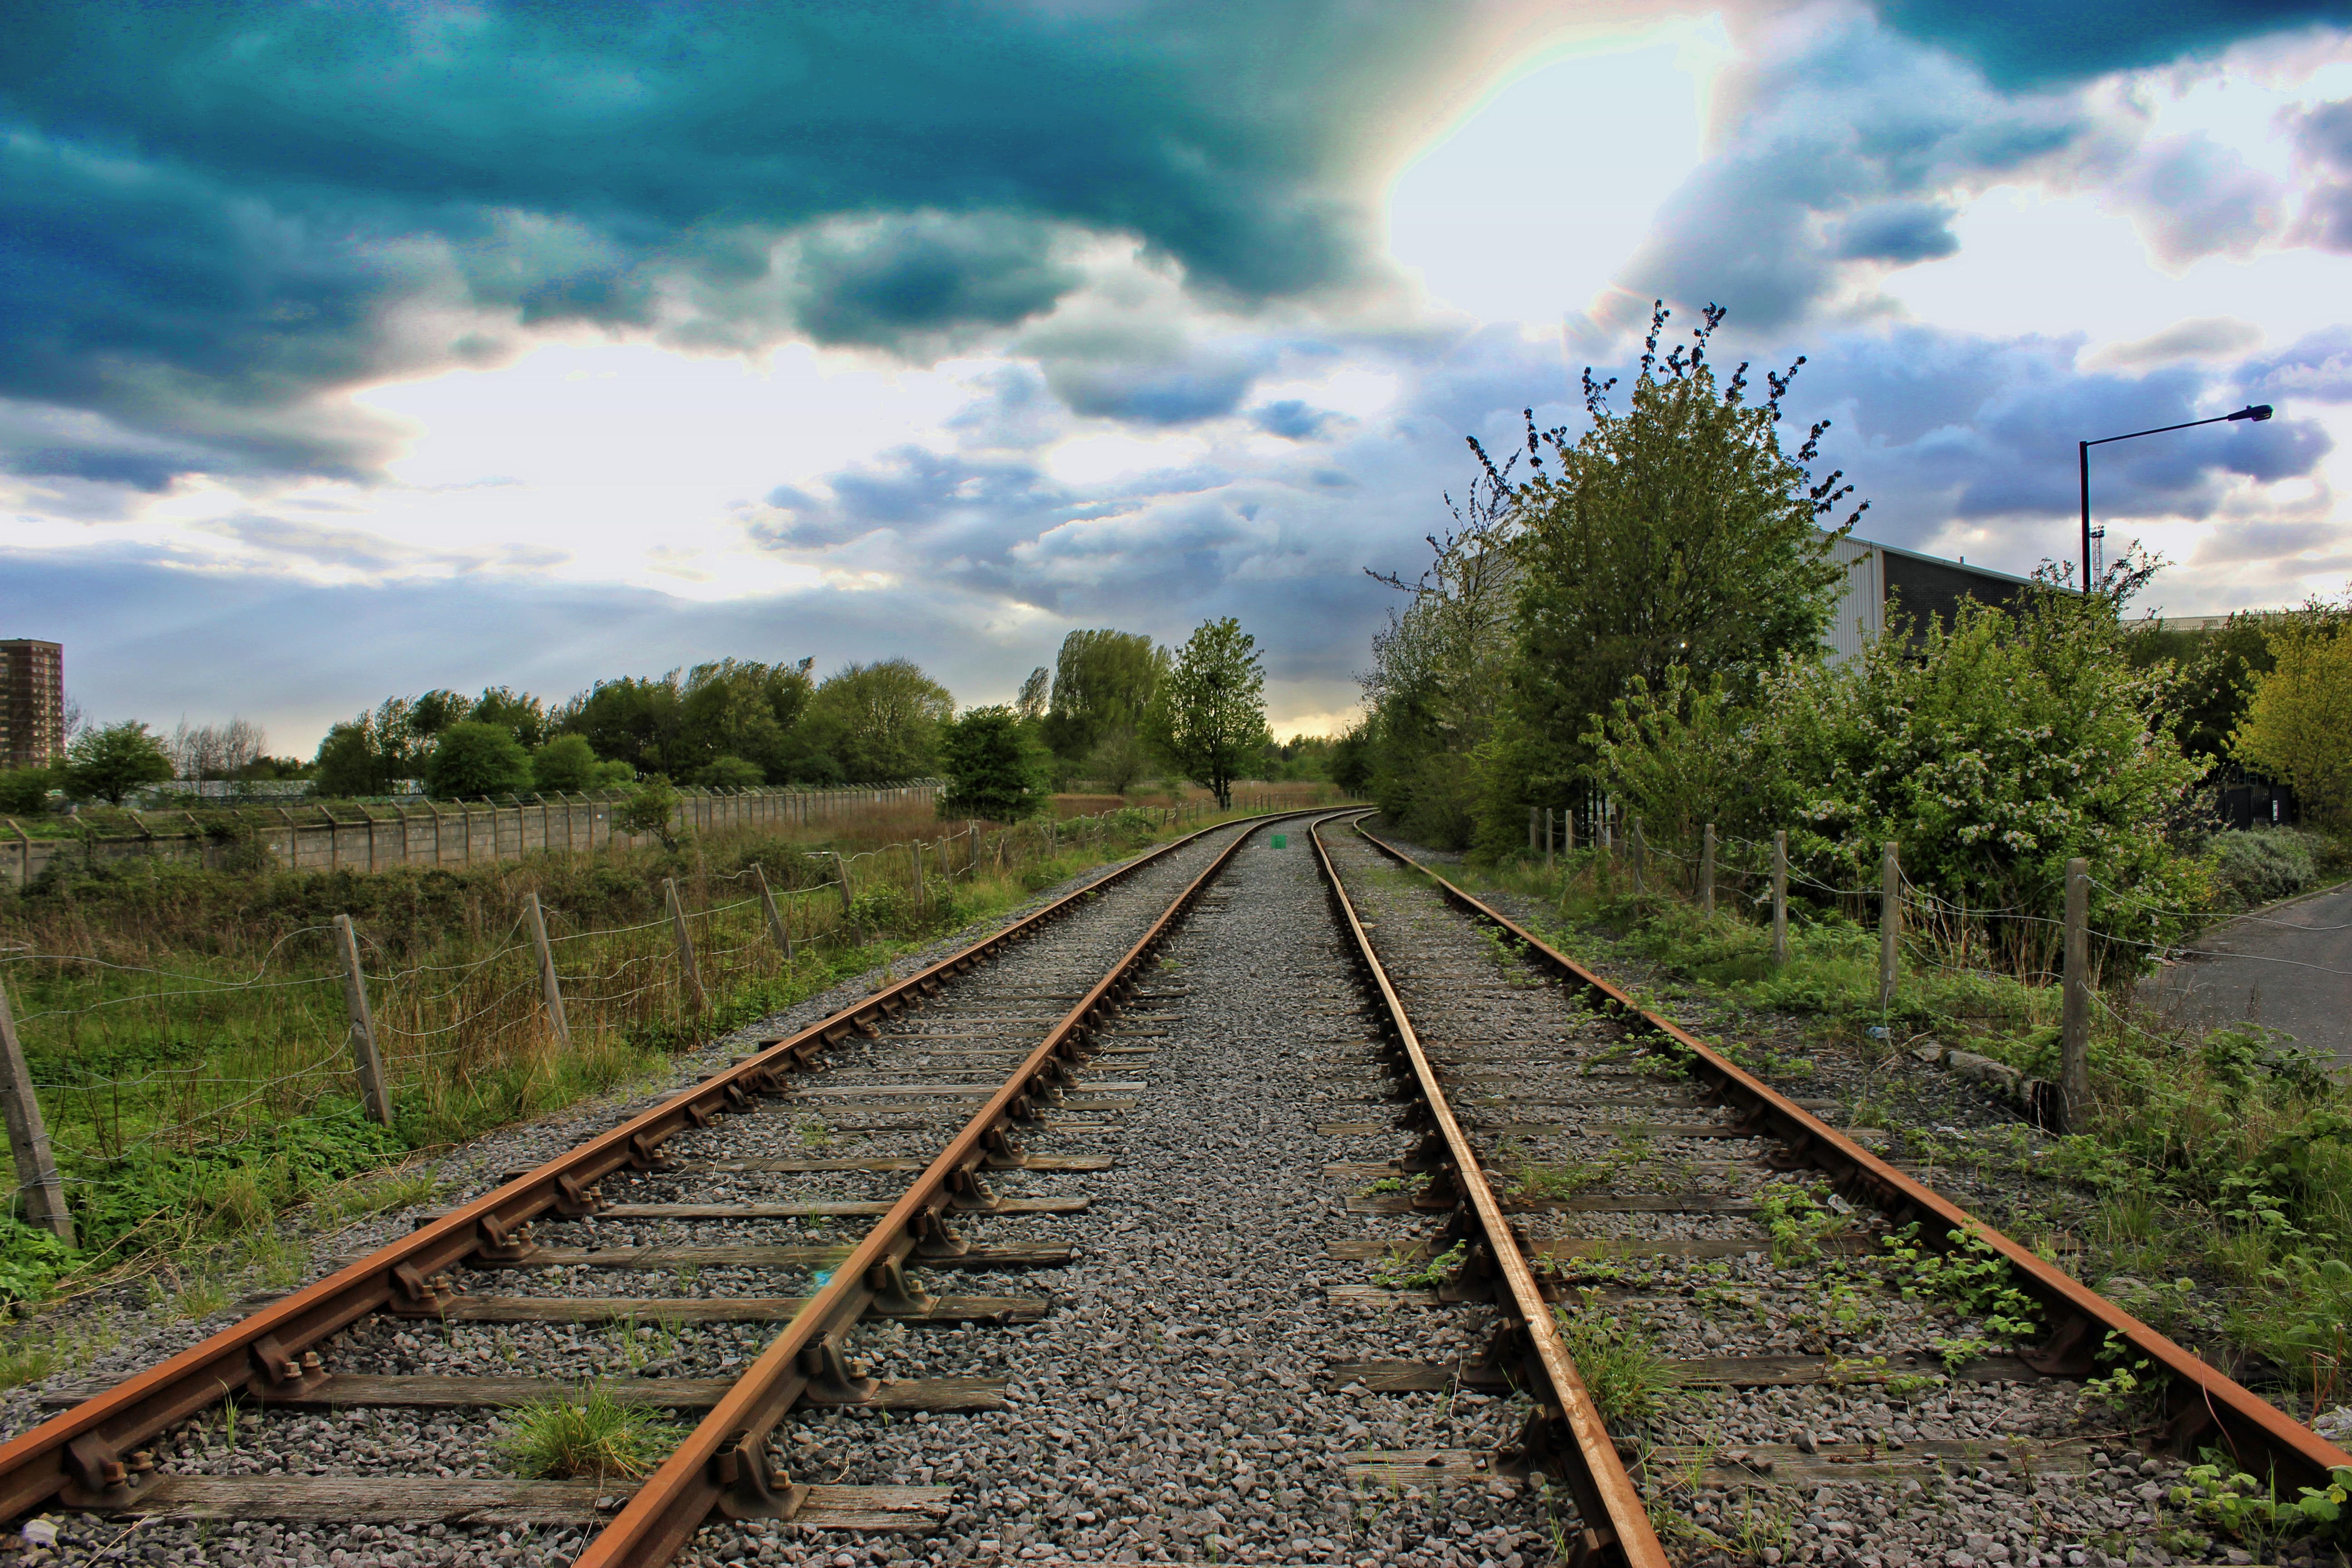 Train Tracks, Bush, Clouds, Rail, Rails, HQ Photo